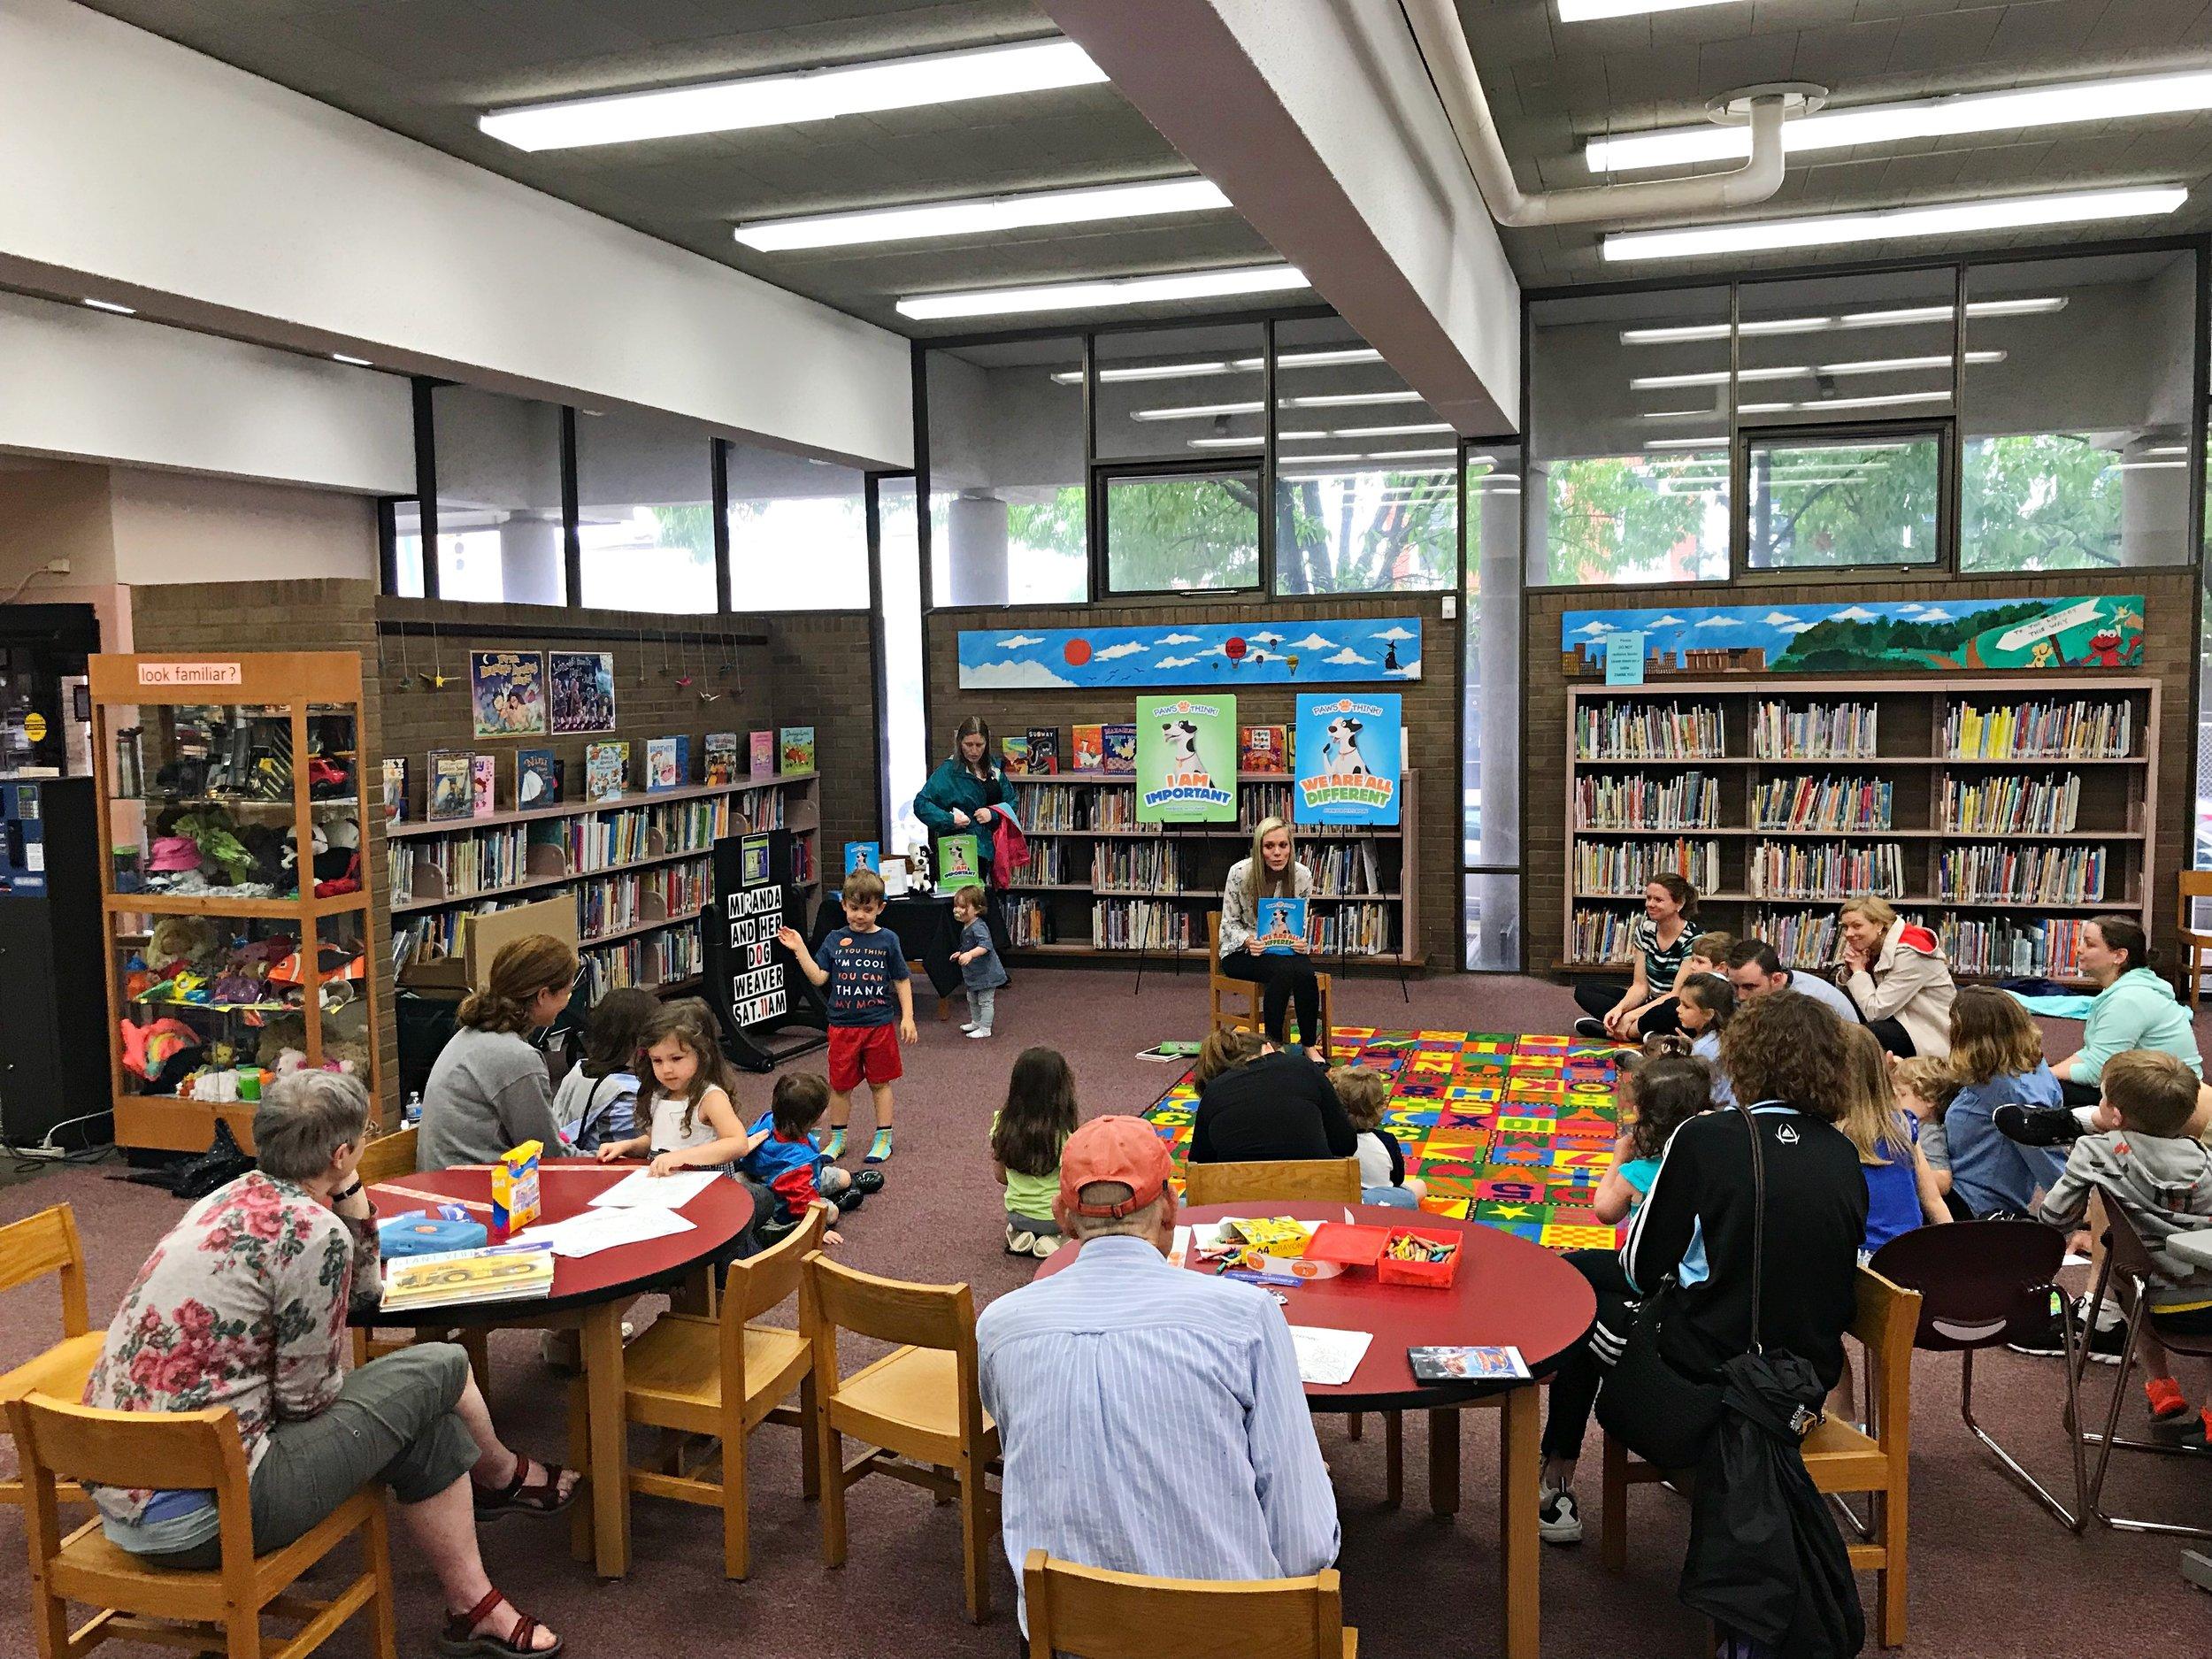 Enoch Pratt Free Library (Light St. Branch)